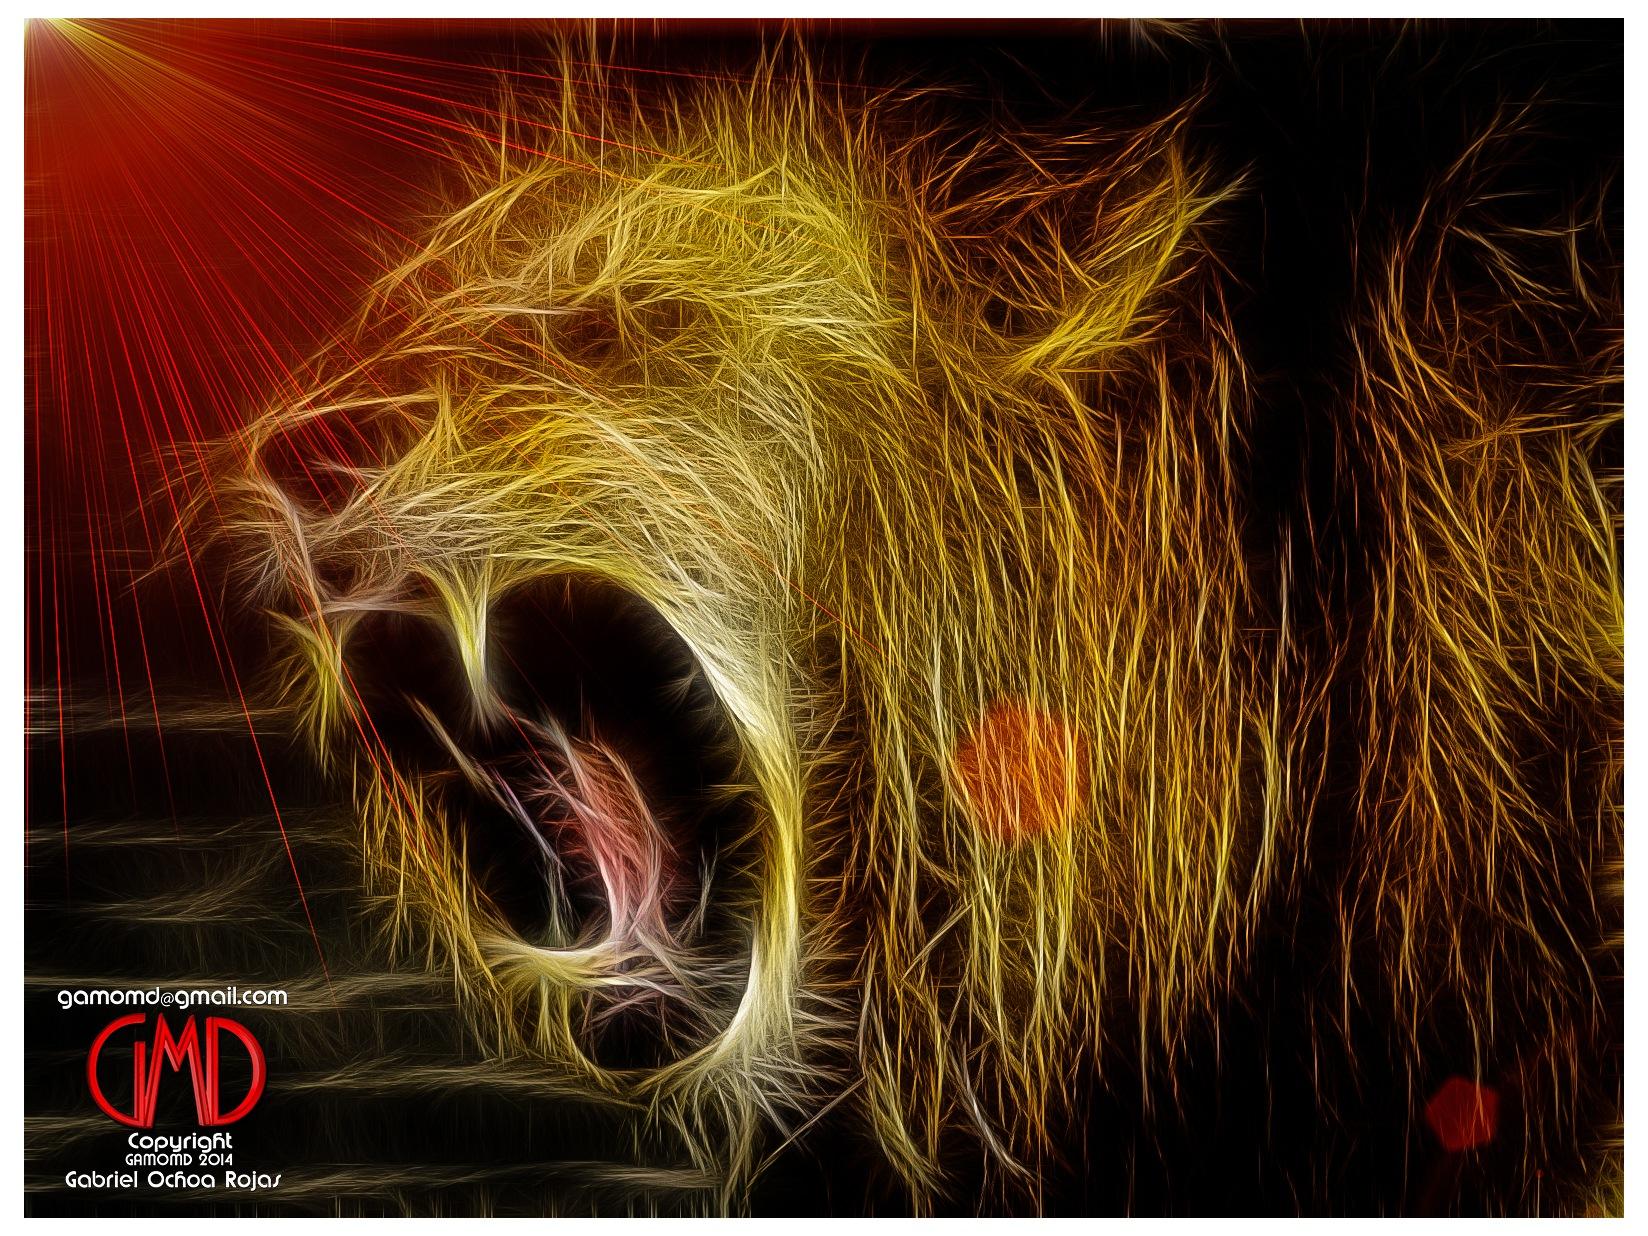 Fractal Lion - León Fractal by Gabriel Ochoa Rojas